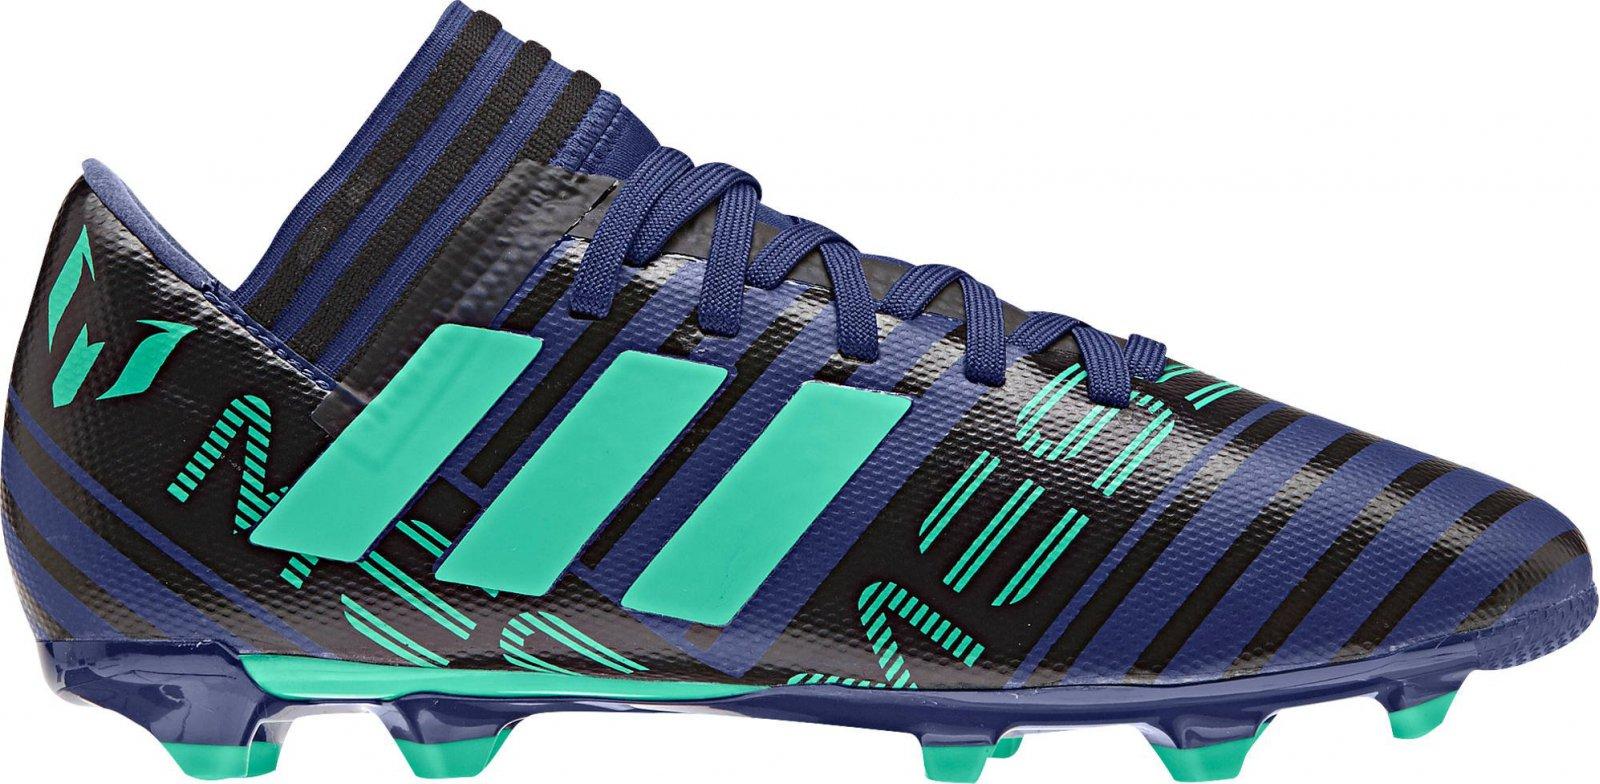 buy popular 62d31 a4f39 Adidas Nemeziz Messi 17.3 34 od 1 049 Kč • Zboží.cz